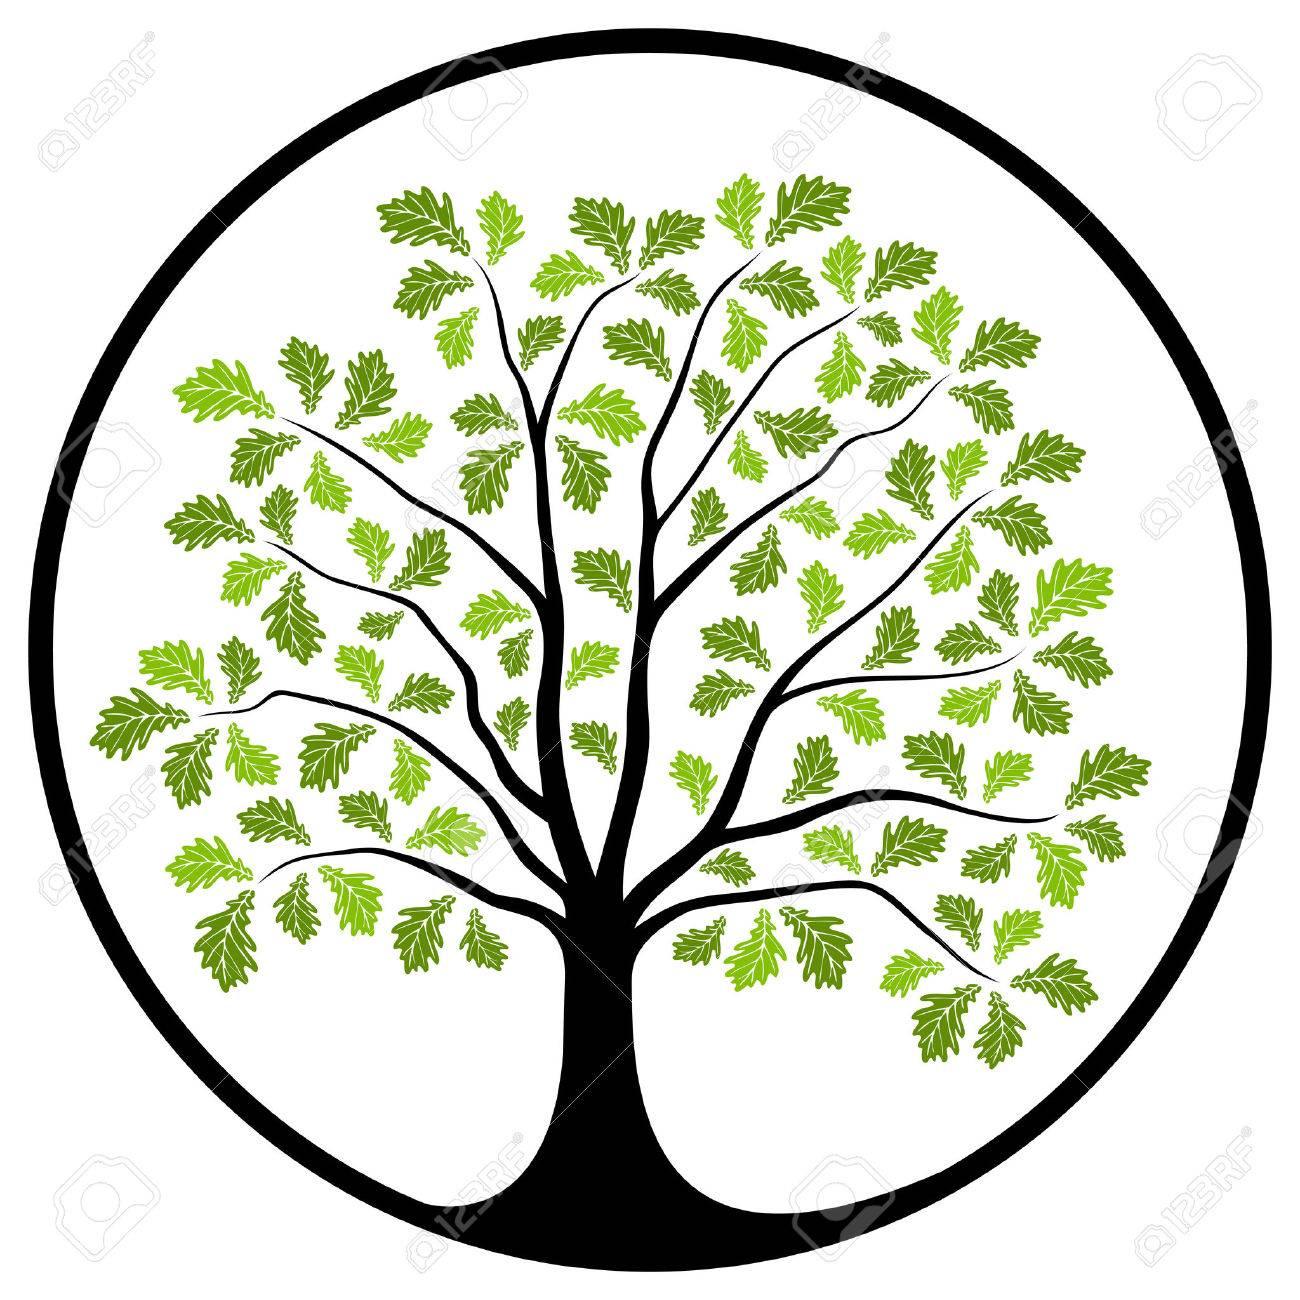 Oaktree clipart vector free library Oak tree free clipart 3 » Clipart Station vector free library